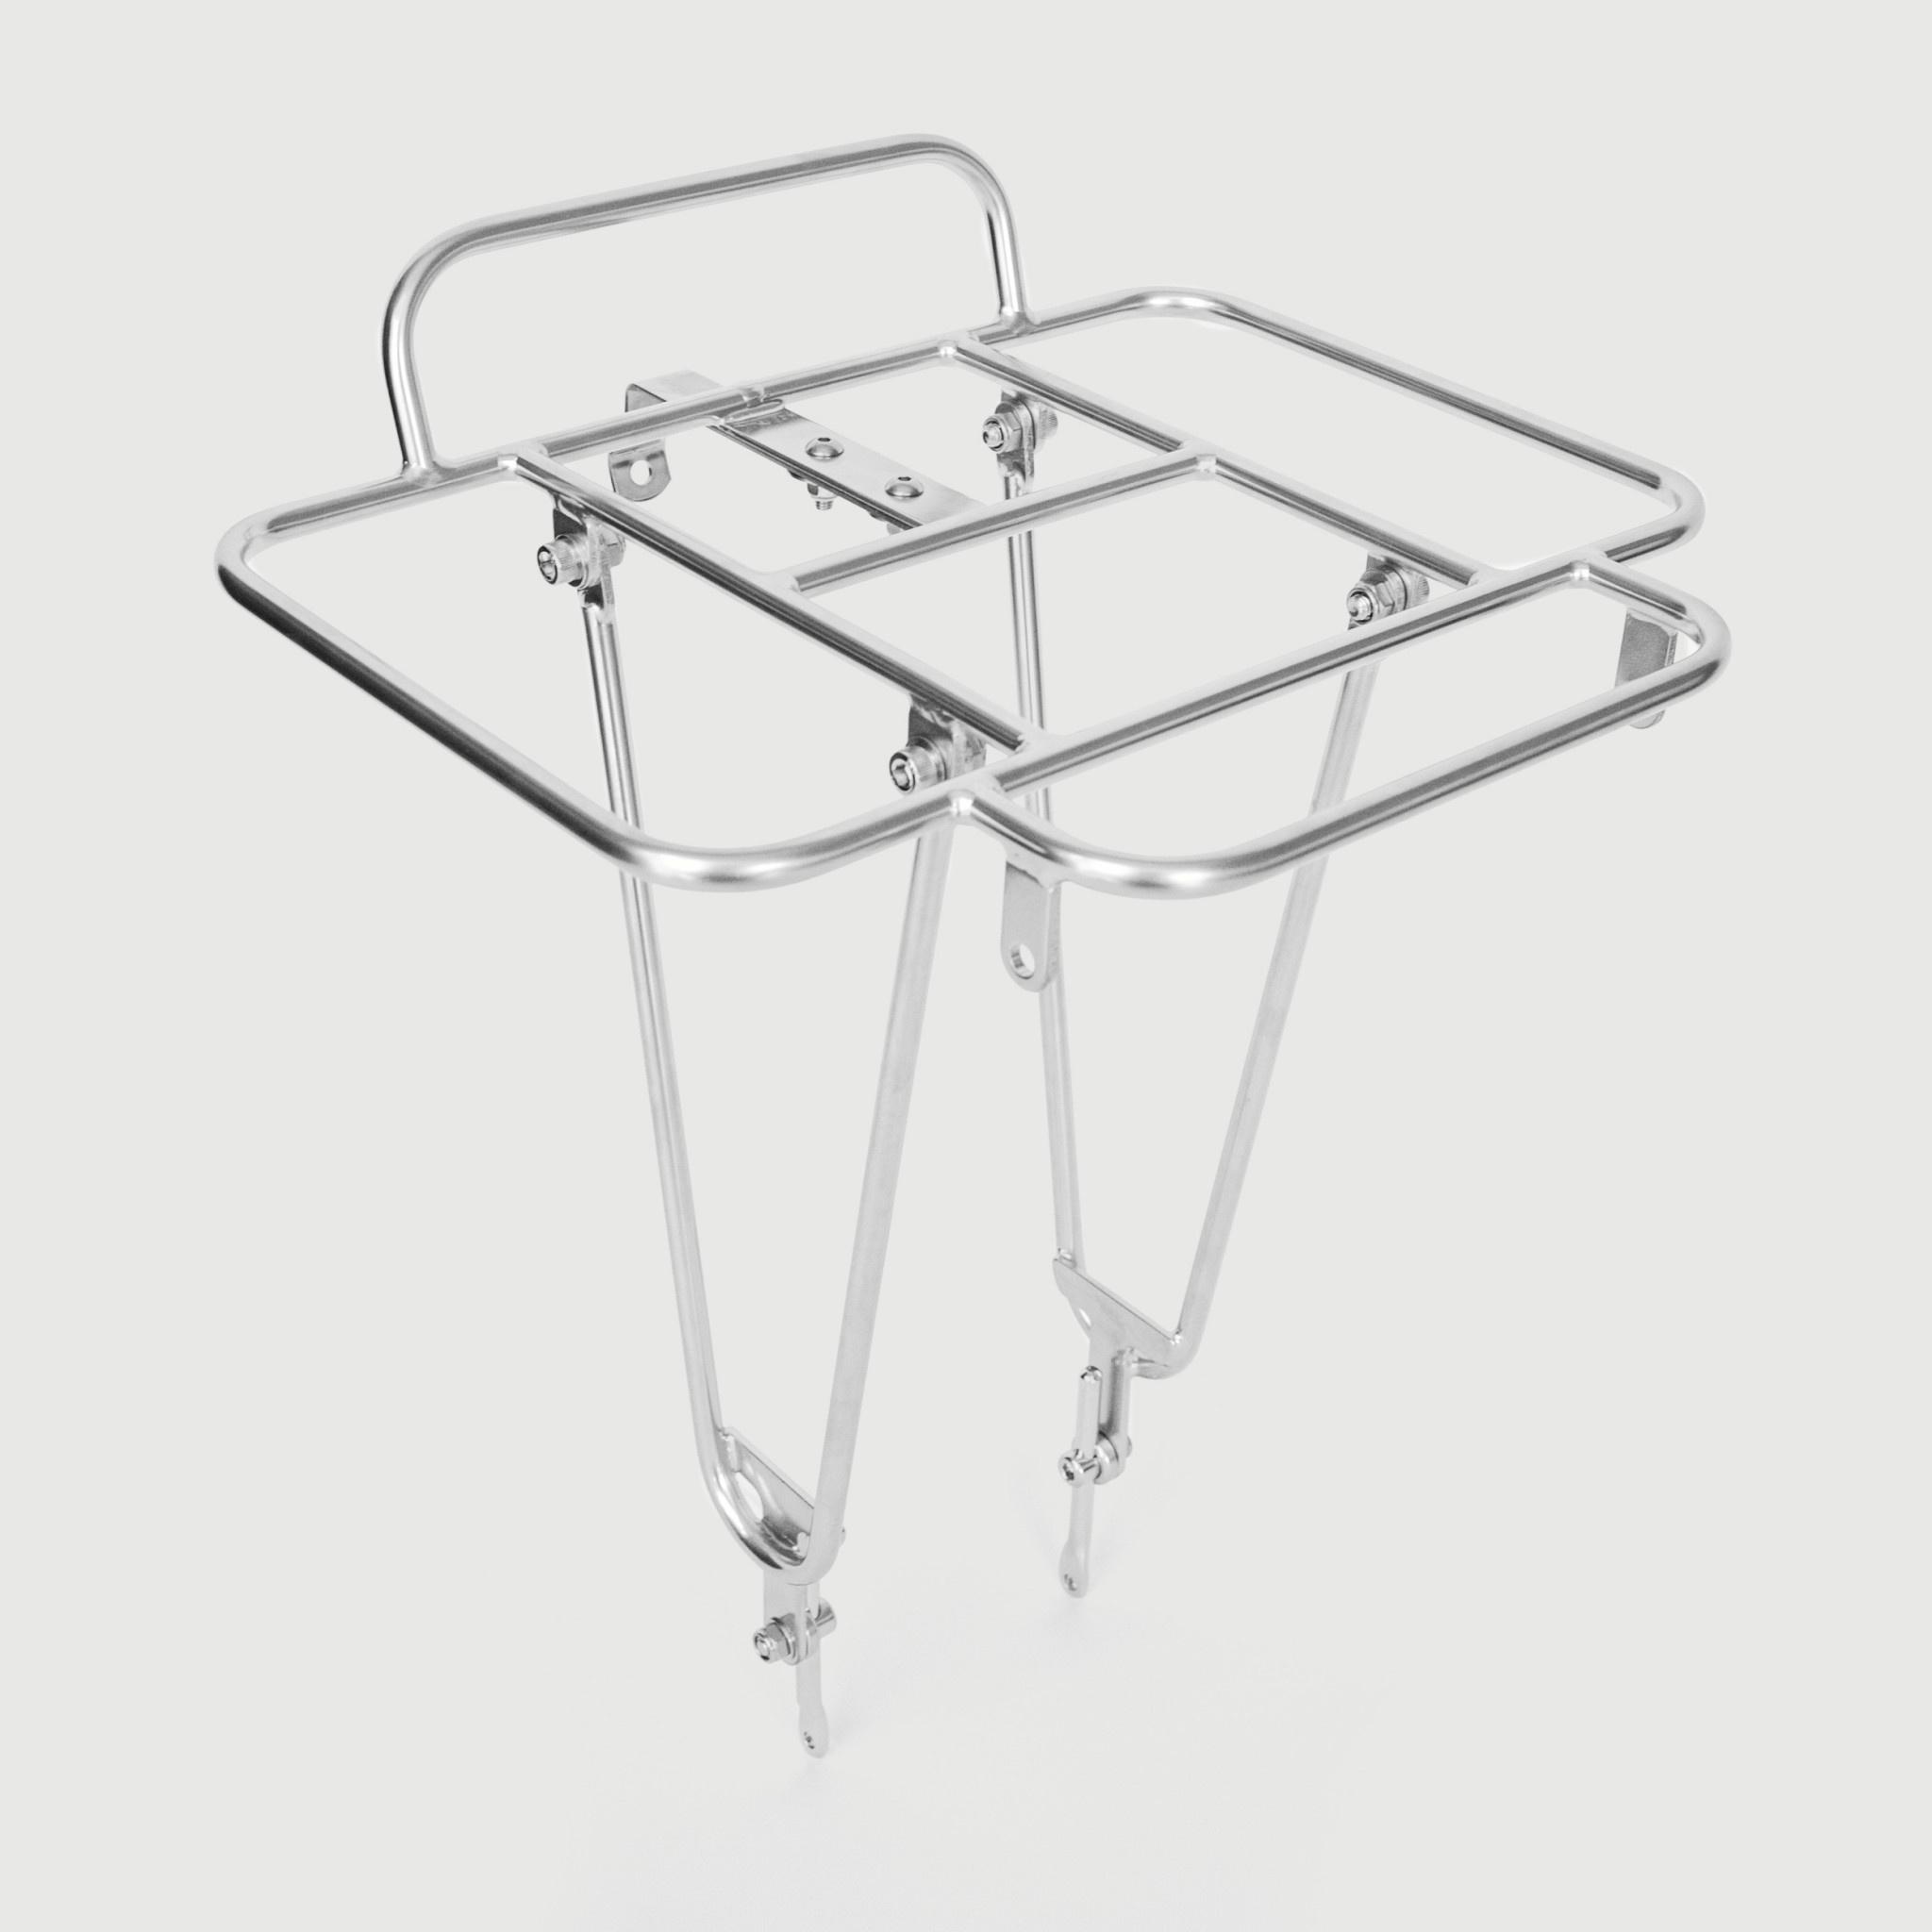 Nitto Rivendell x Nitto - Front rack, 52F basket rack